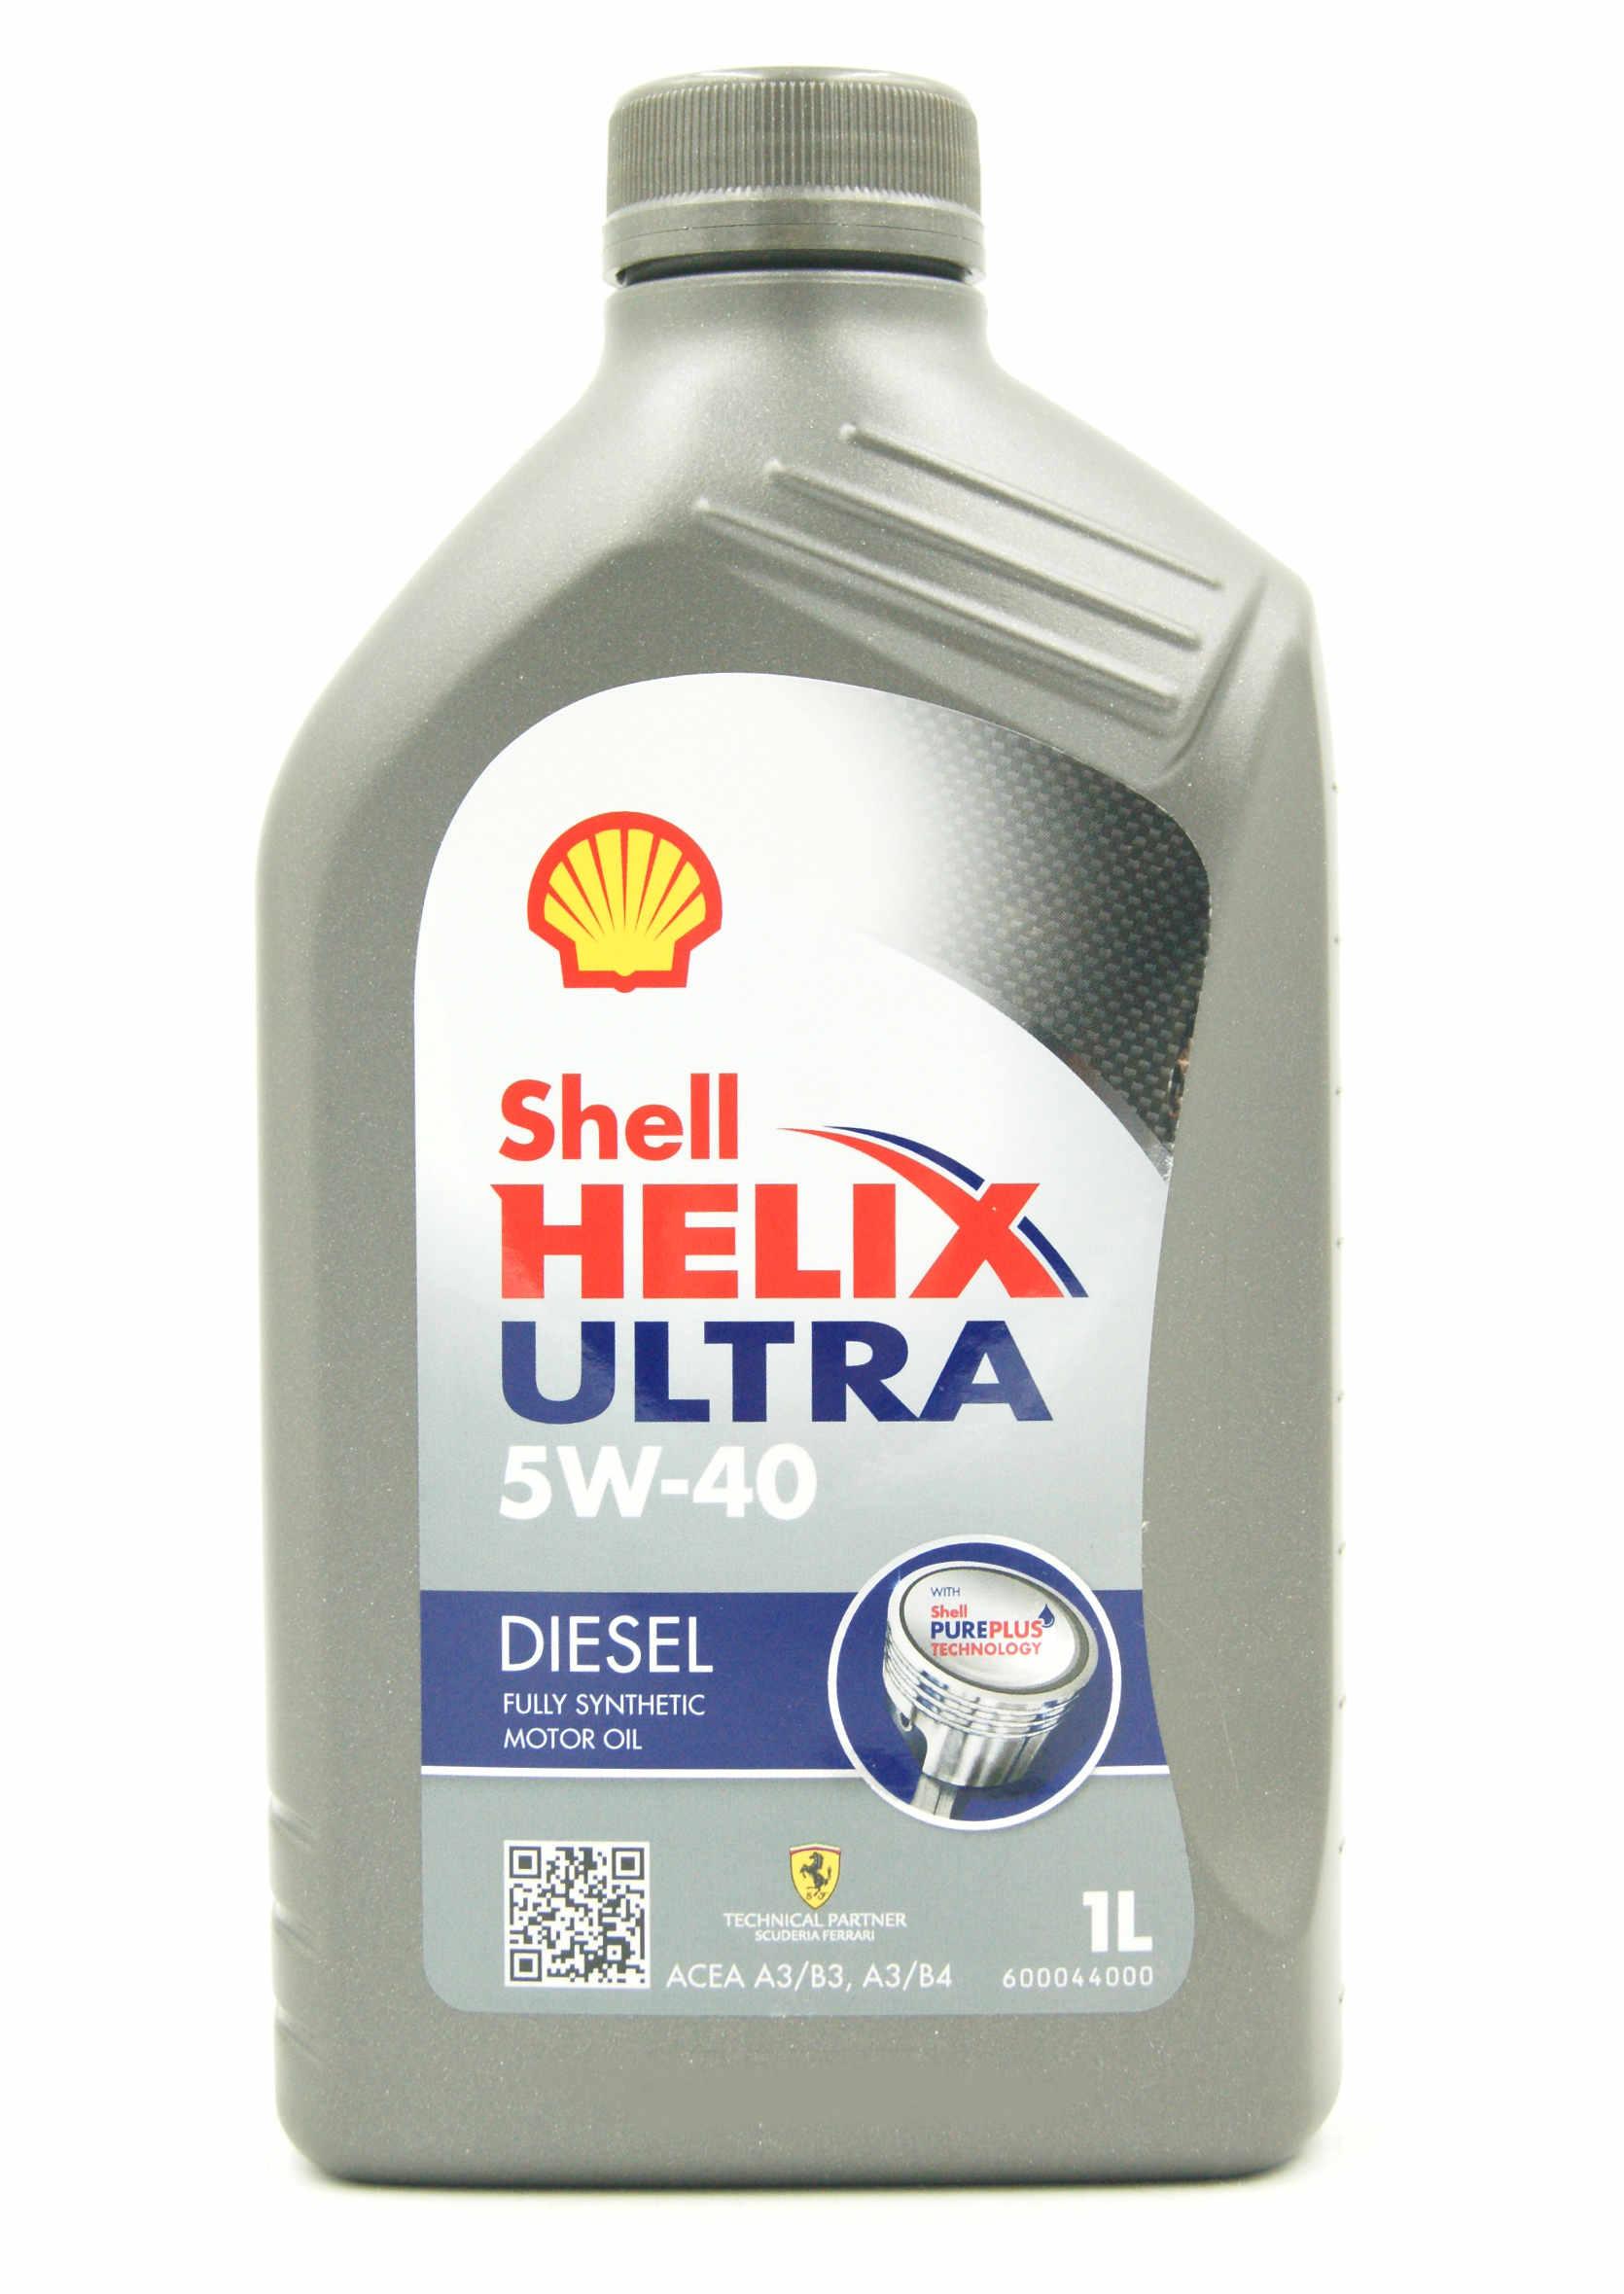 Shell Helix Ultra Diesel 5W-40 1L Olej Syntetyczny